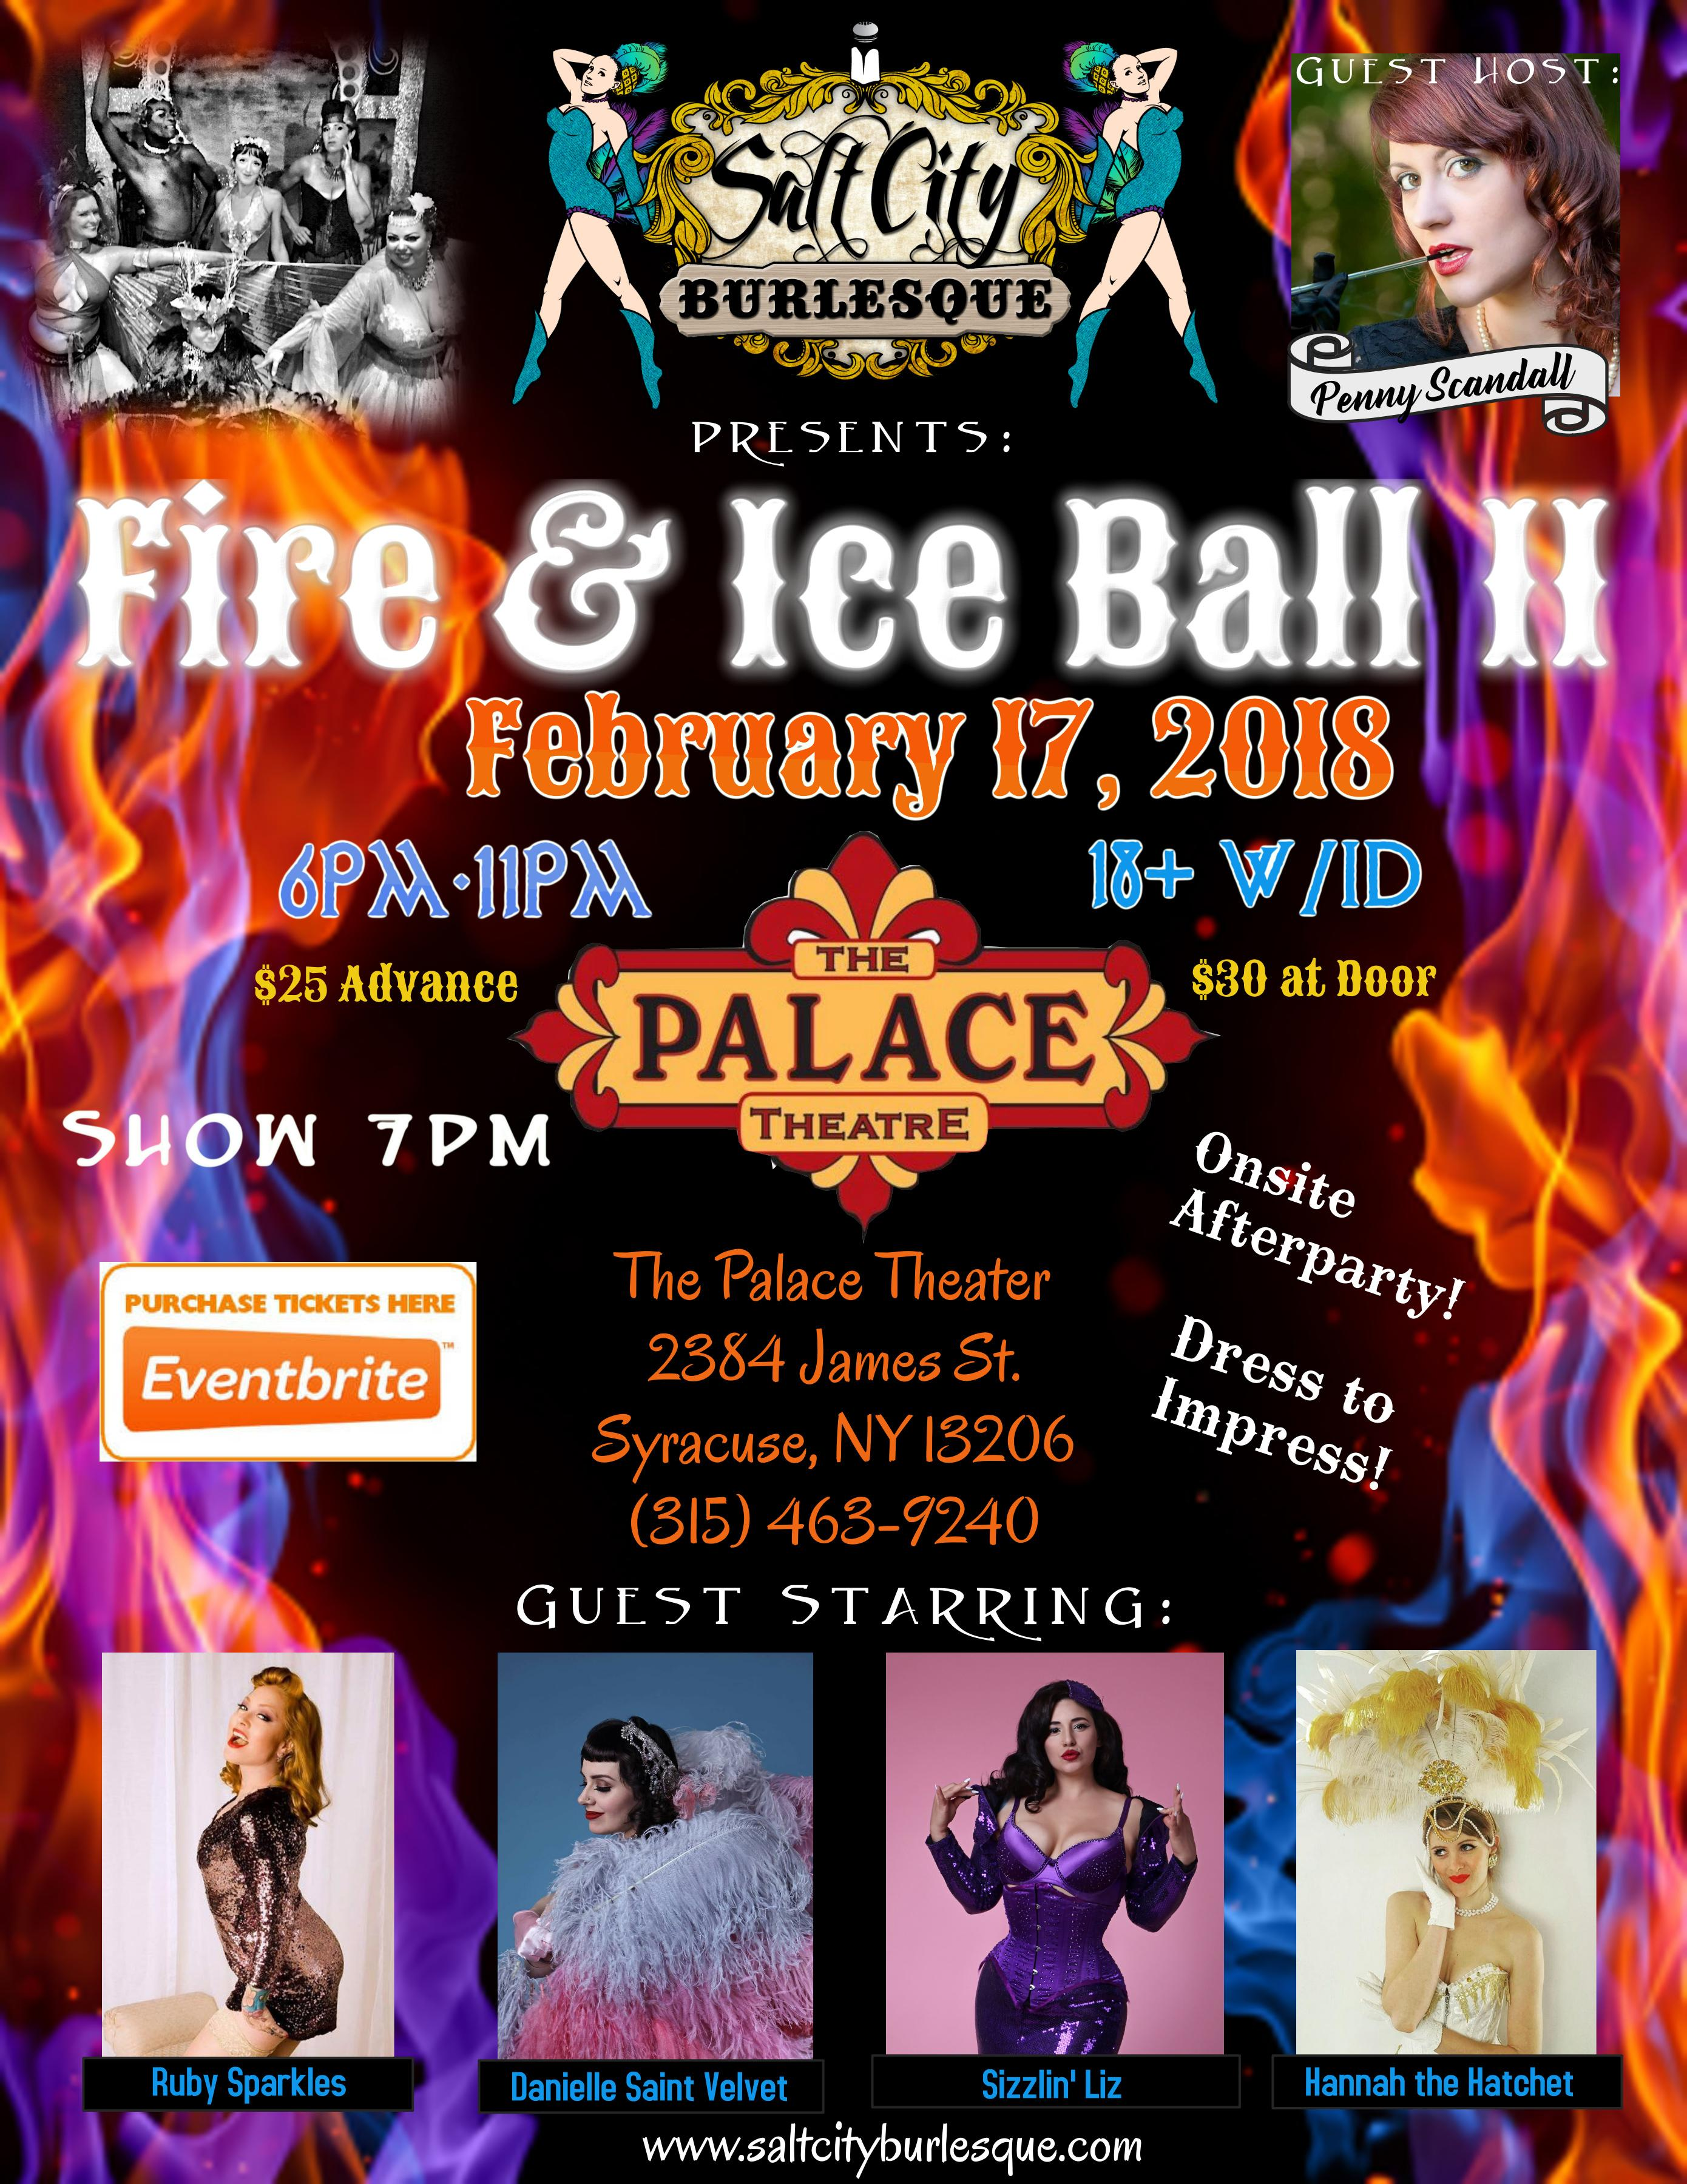 Salt City Burlesque Presents: Fire & Ice Ball